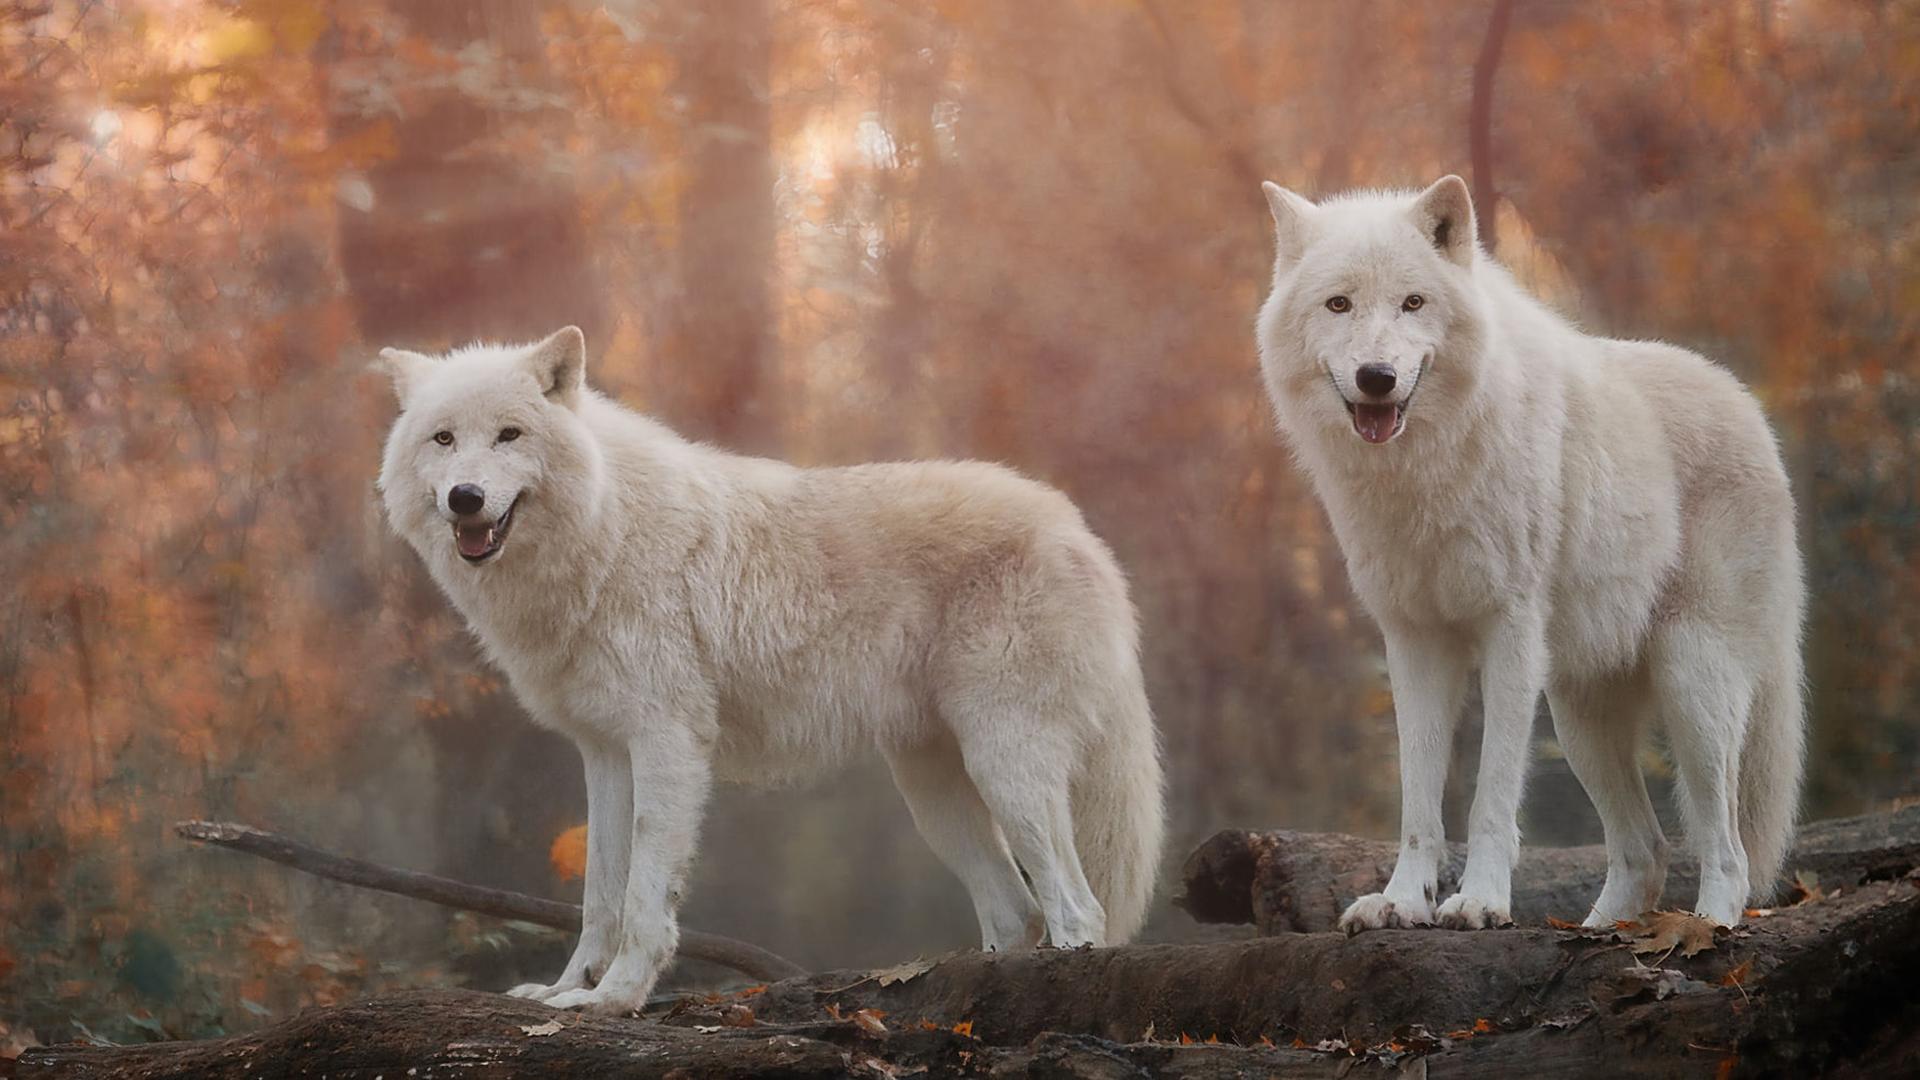 Wallpapers predators w lfe white wolf f r desktop 159828 for Minimalismus haustiere